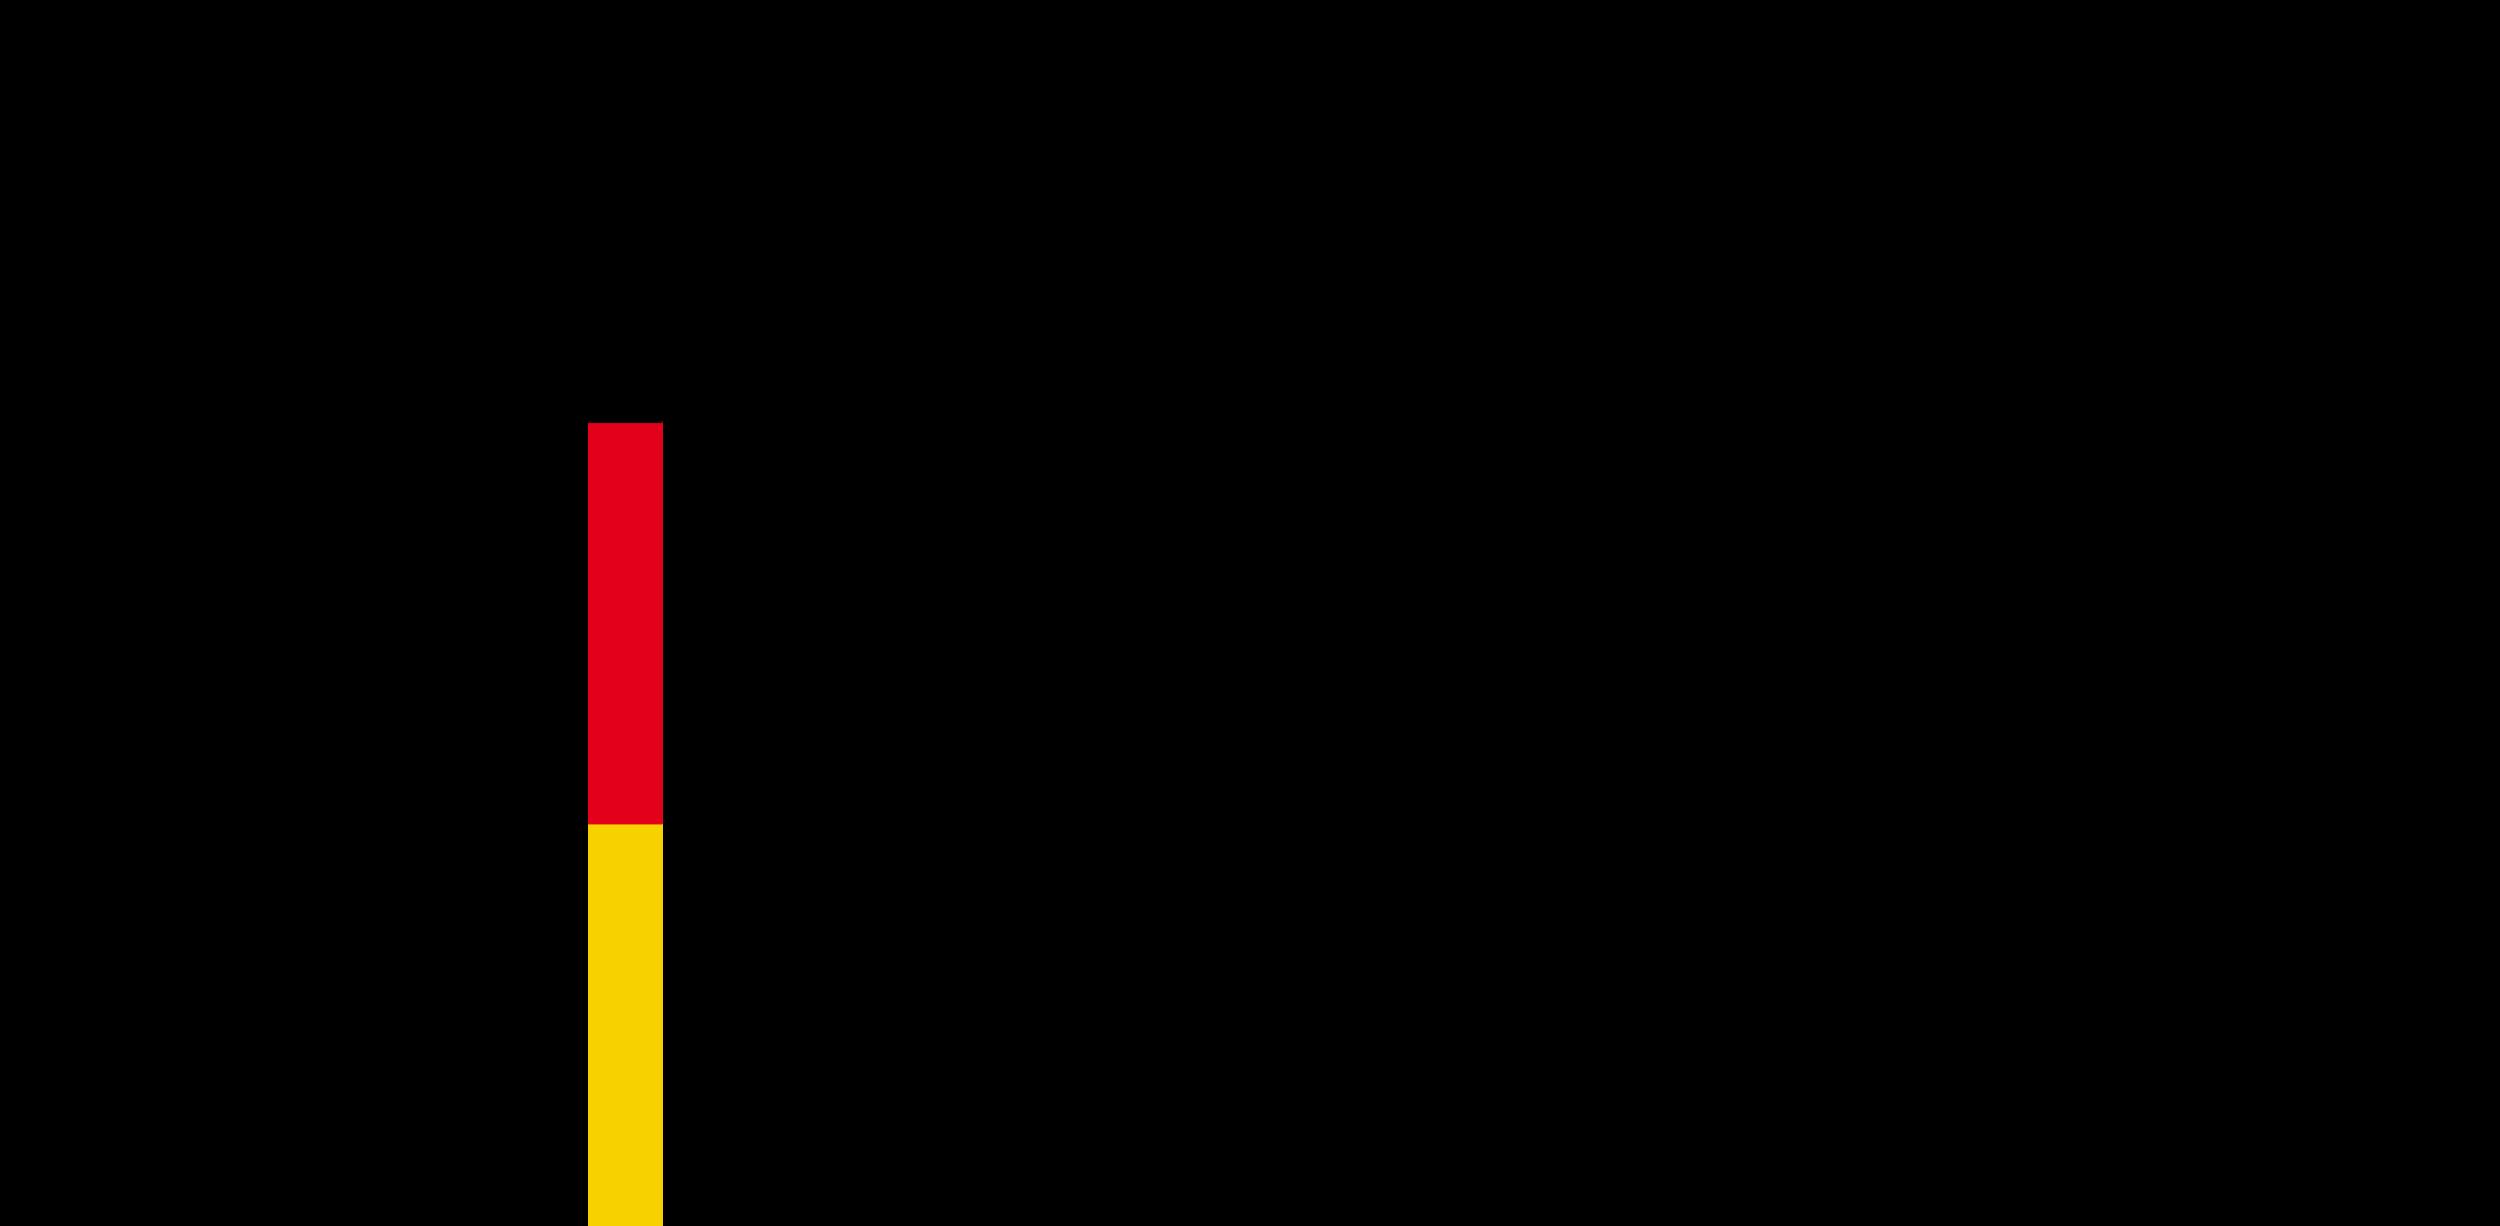 BMEL_Logo.c0f62b31.png